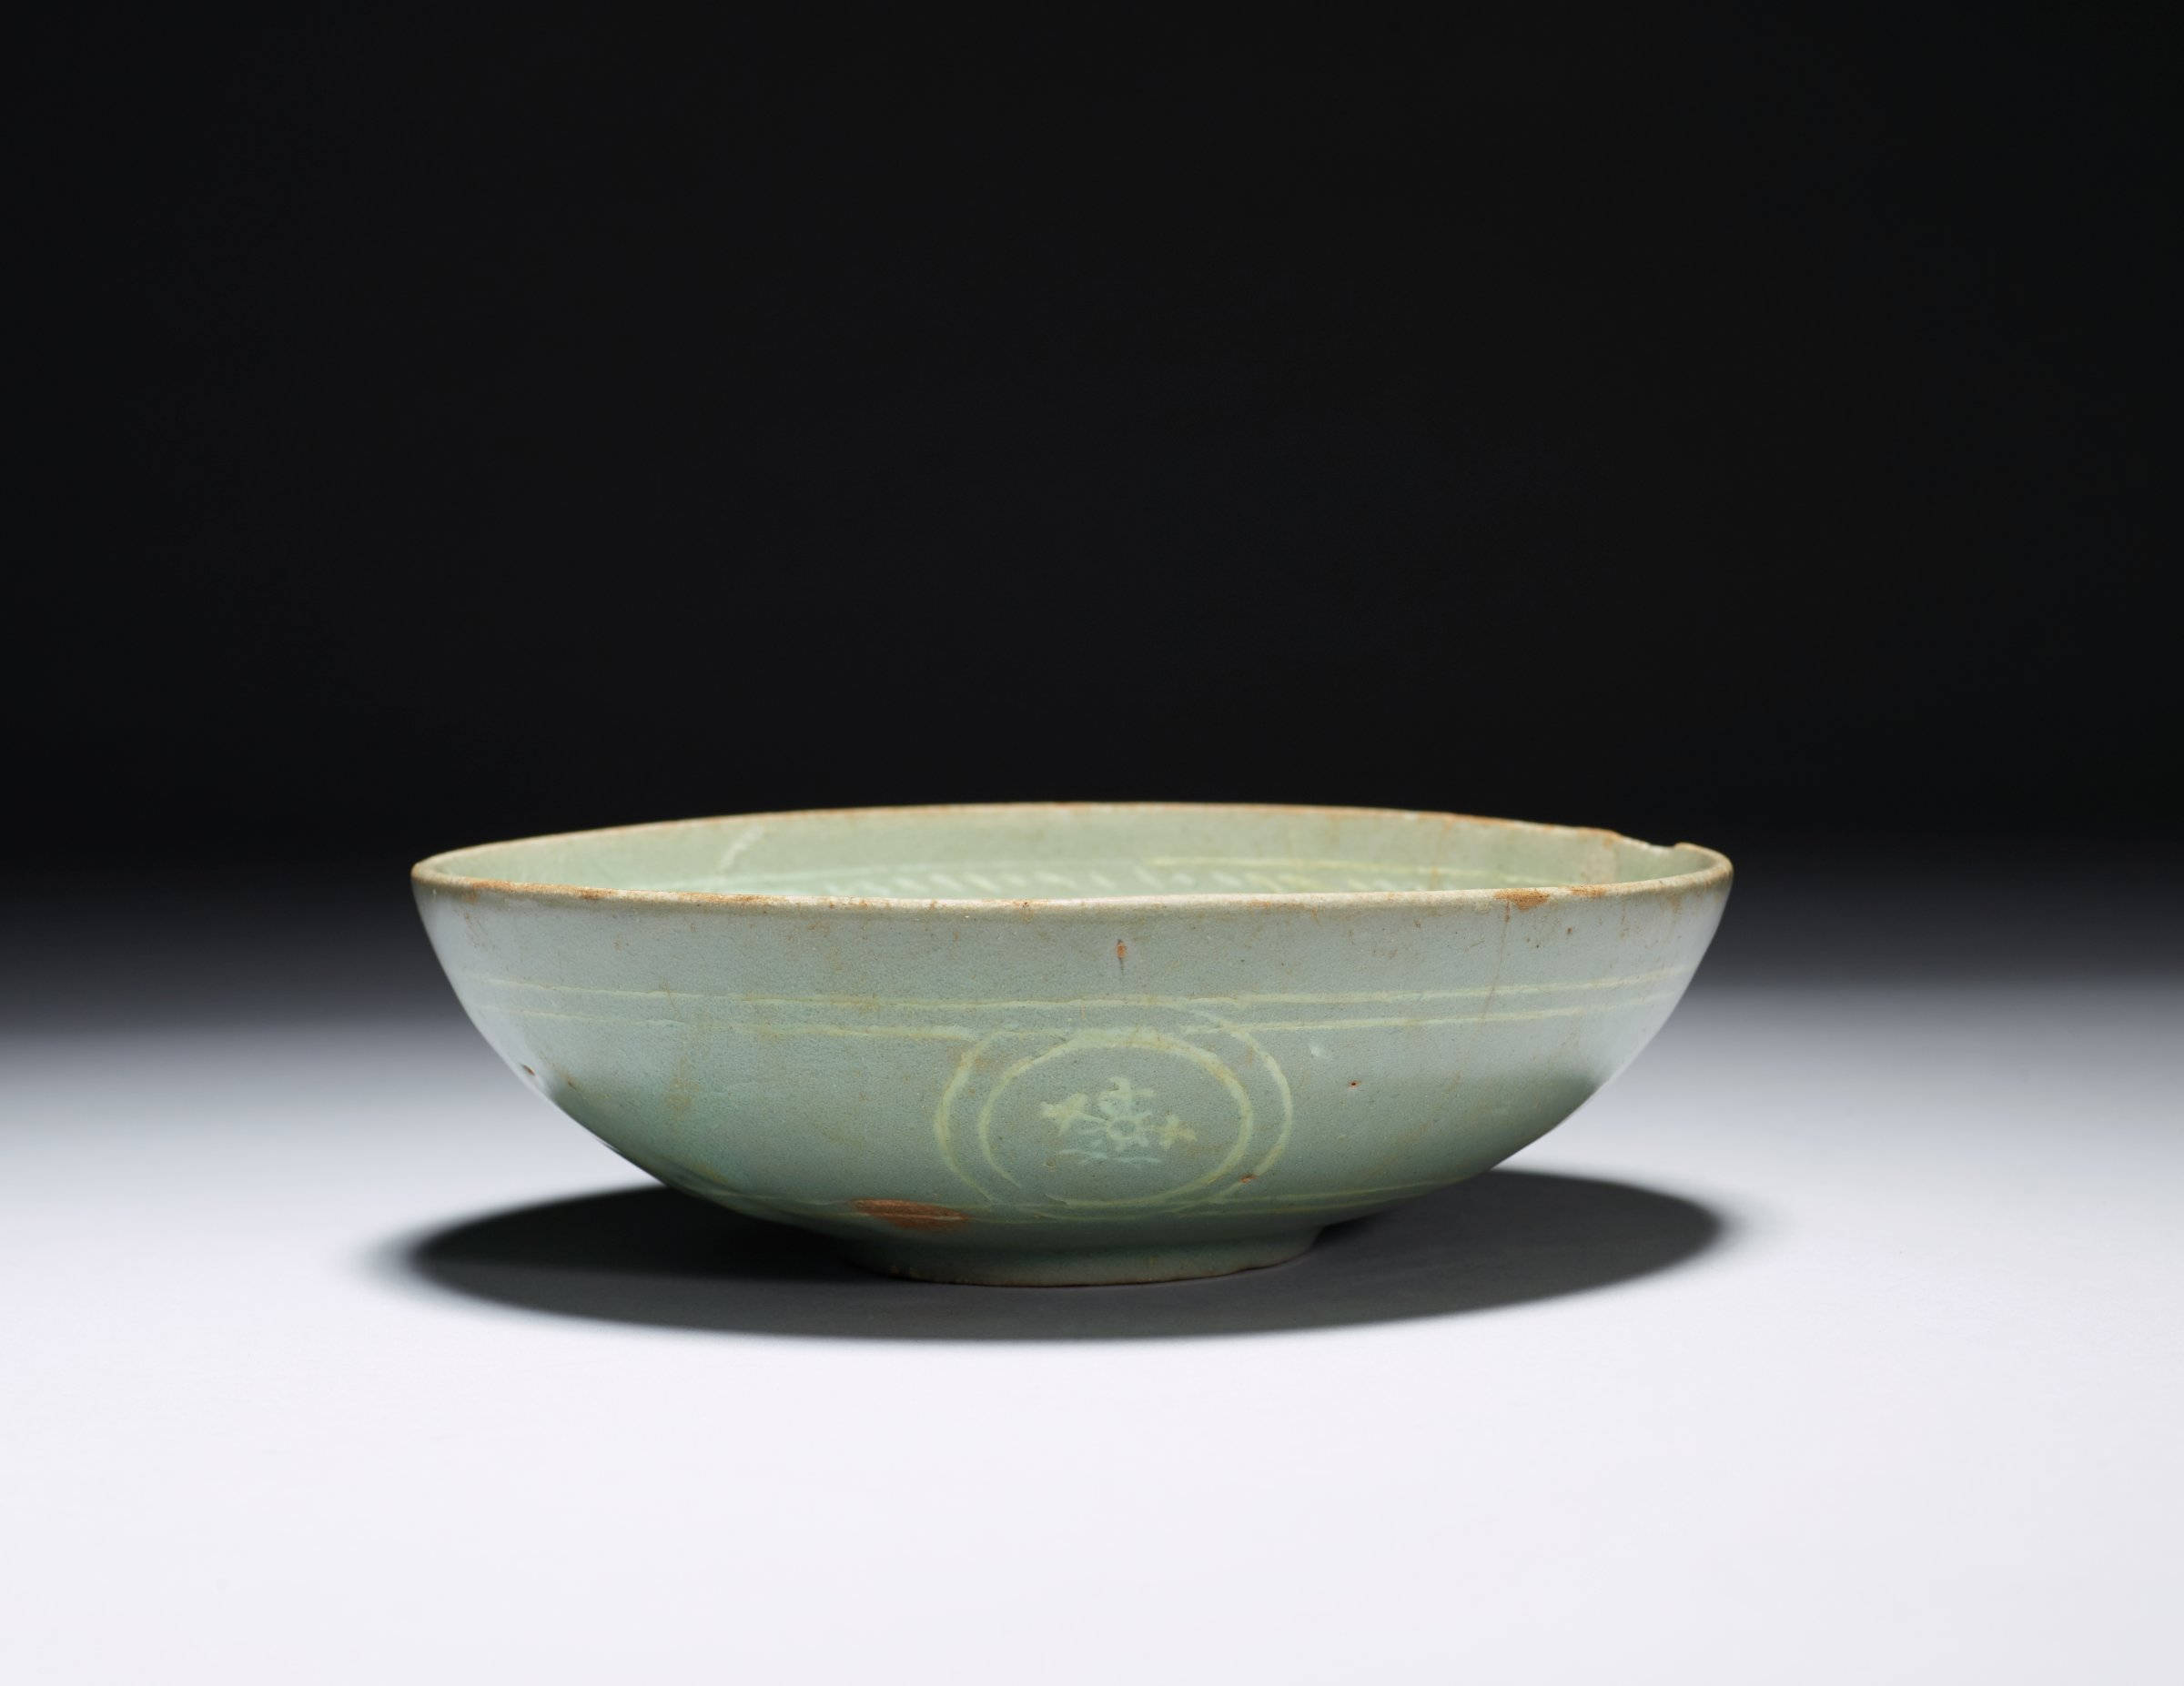 Celadon Bowl with Triple Lichee, Lotus and Chyrsanthemum Motifs in Inlaid Slip